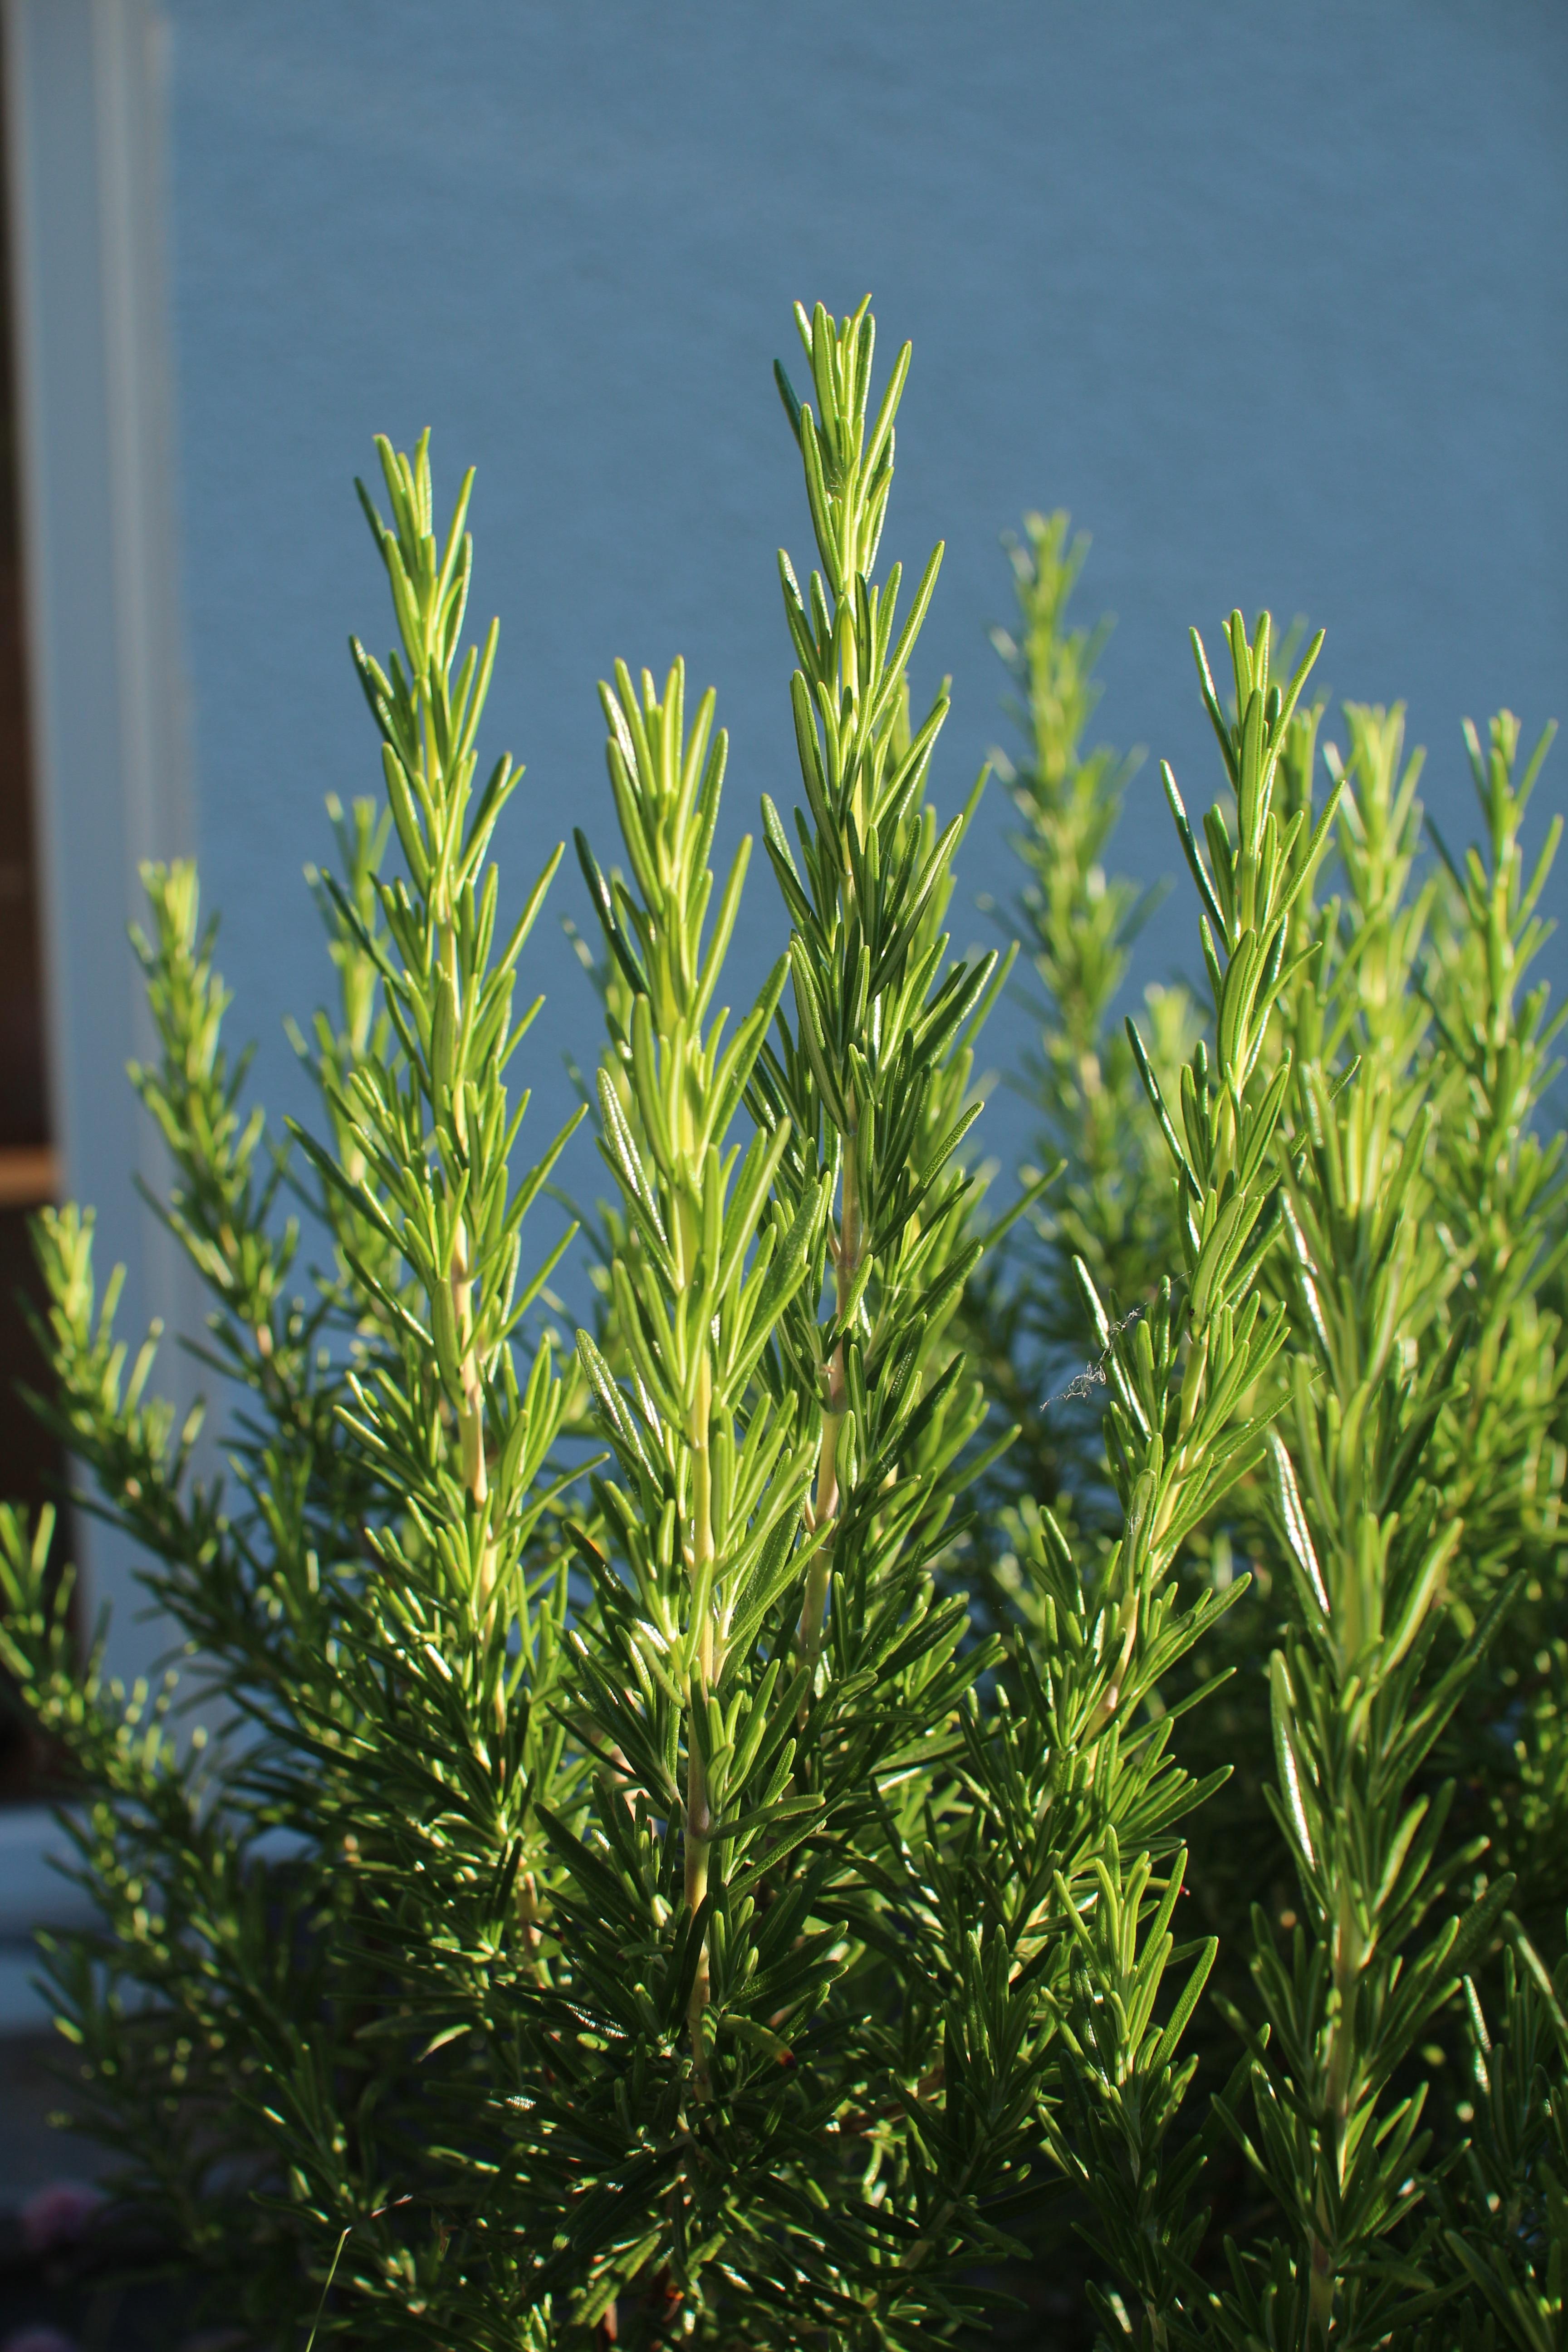 Fotos gratis rbol c sped rama planta flor comida for Arboles de hoja perenne para jardin